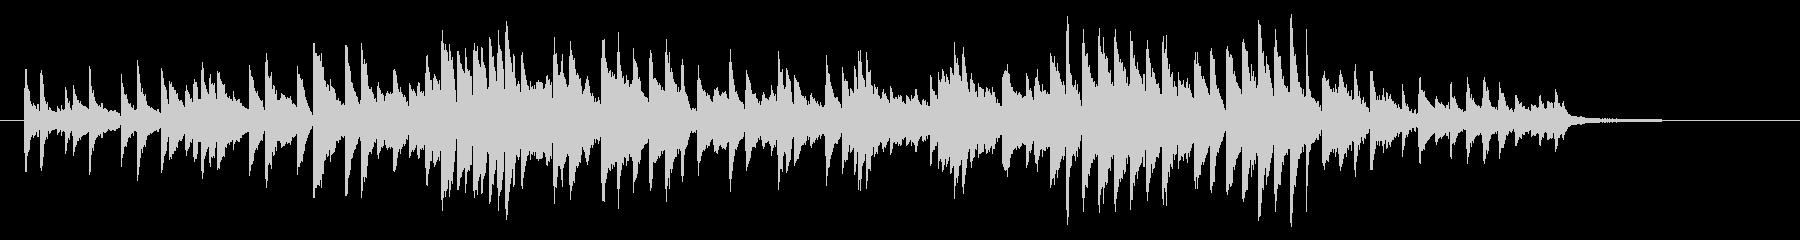 CMや映像をイメージした幻想的なピアノ曲の未再生の波形